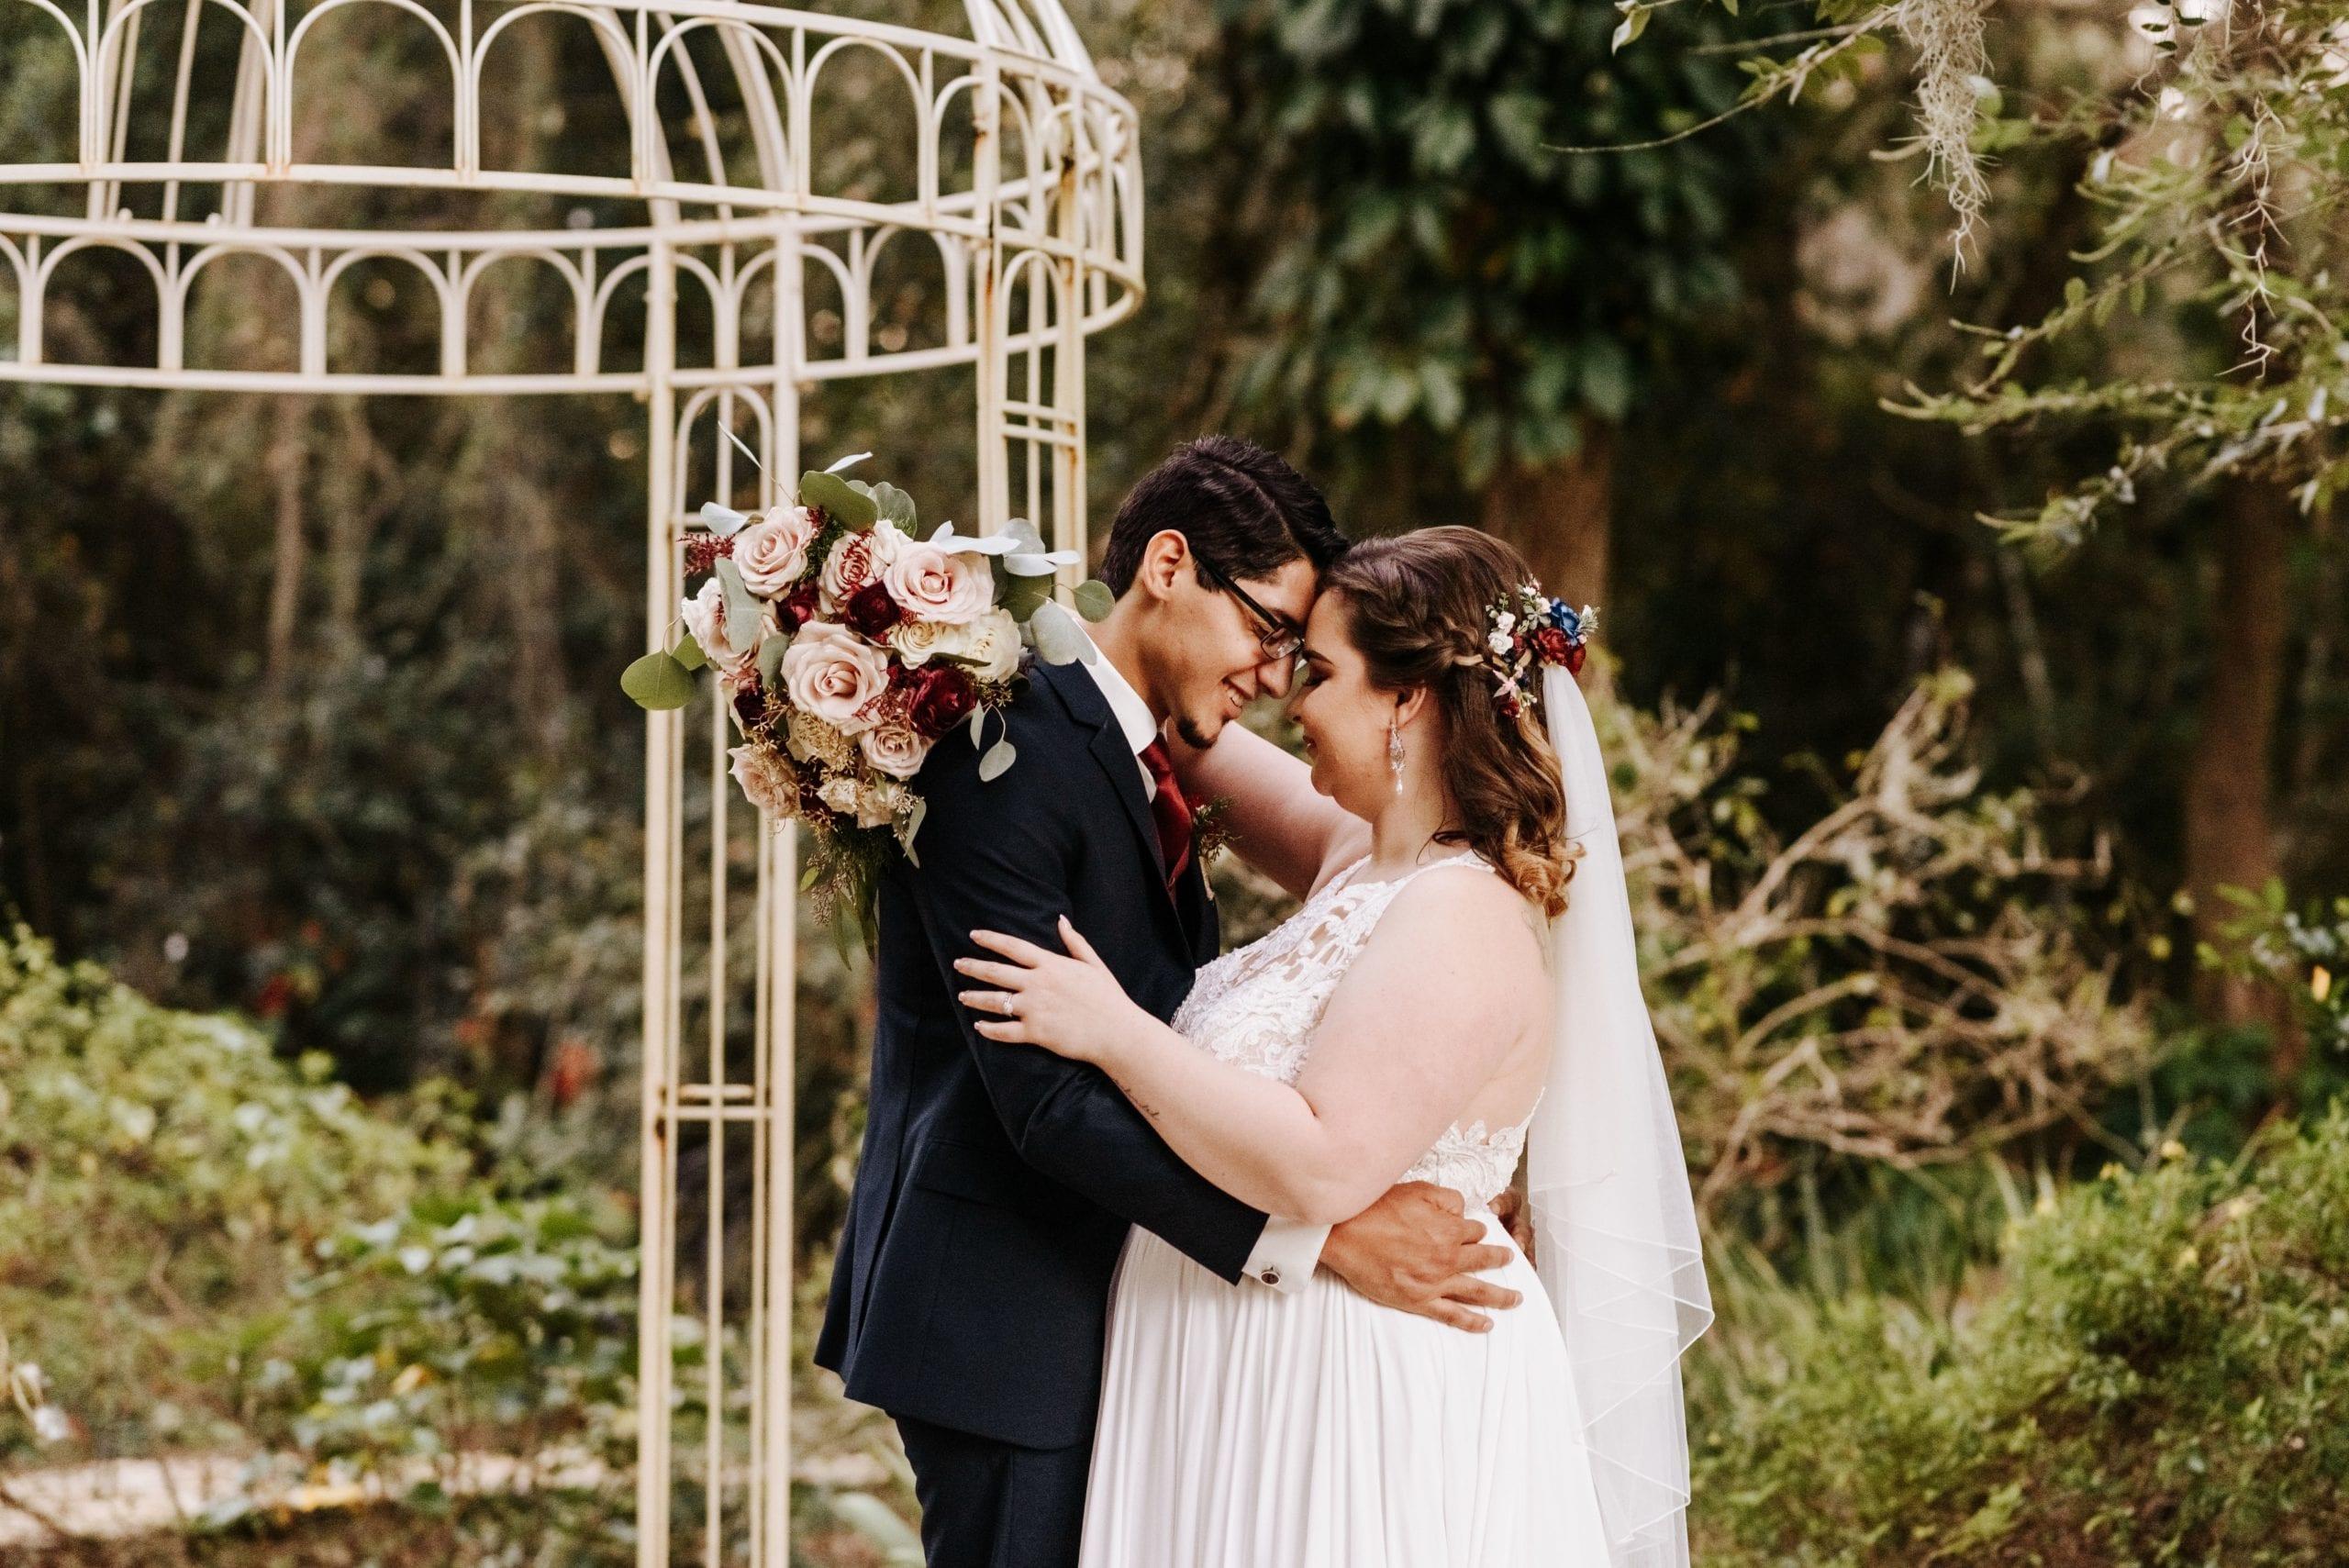 Merrisa + Jeremy's Dreamy Intimate Wedding